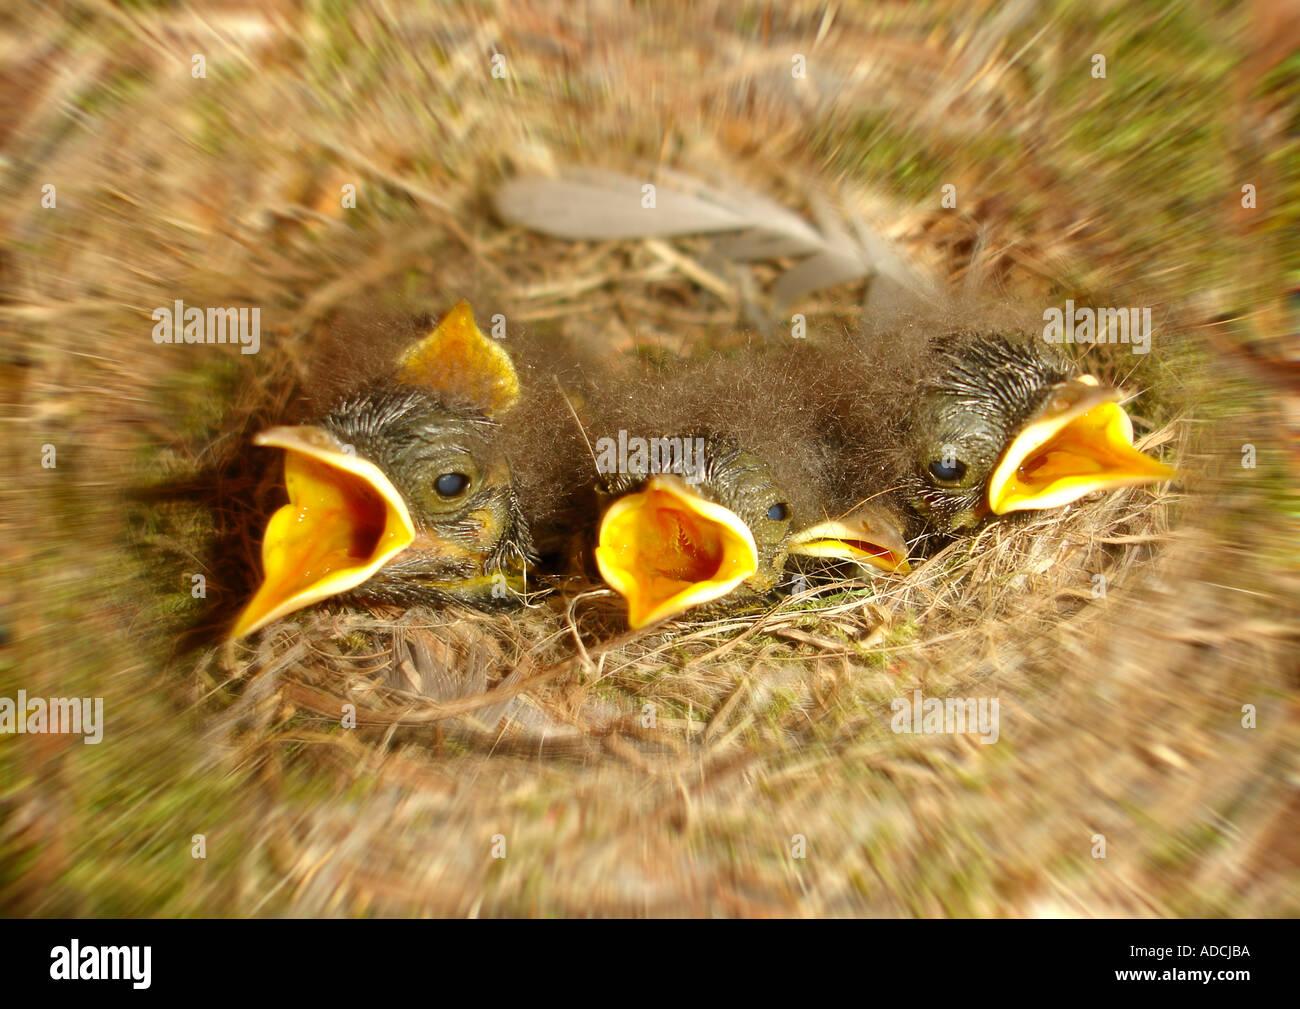 Jungvögel im Nest Jungvögel Im Nest Stockbild